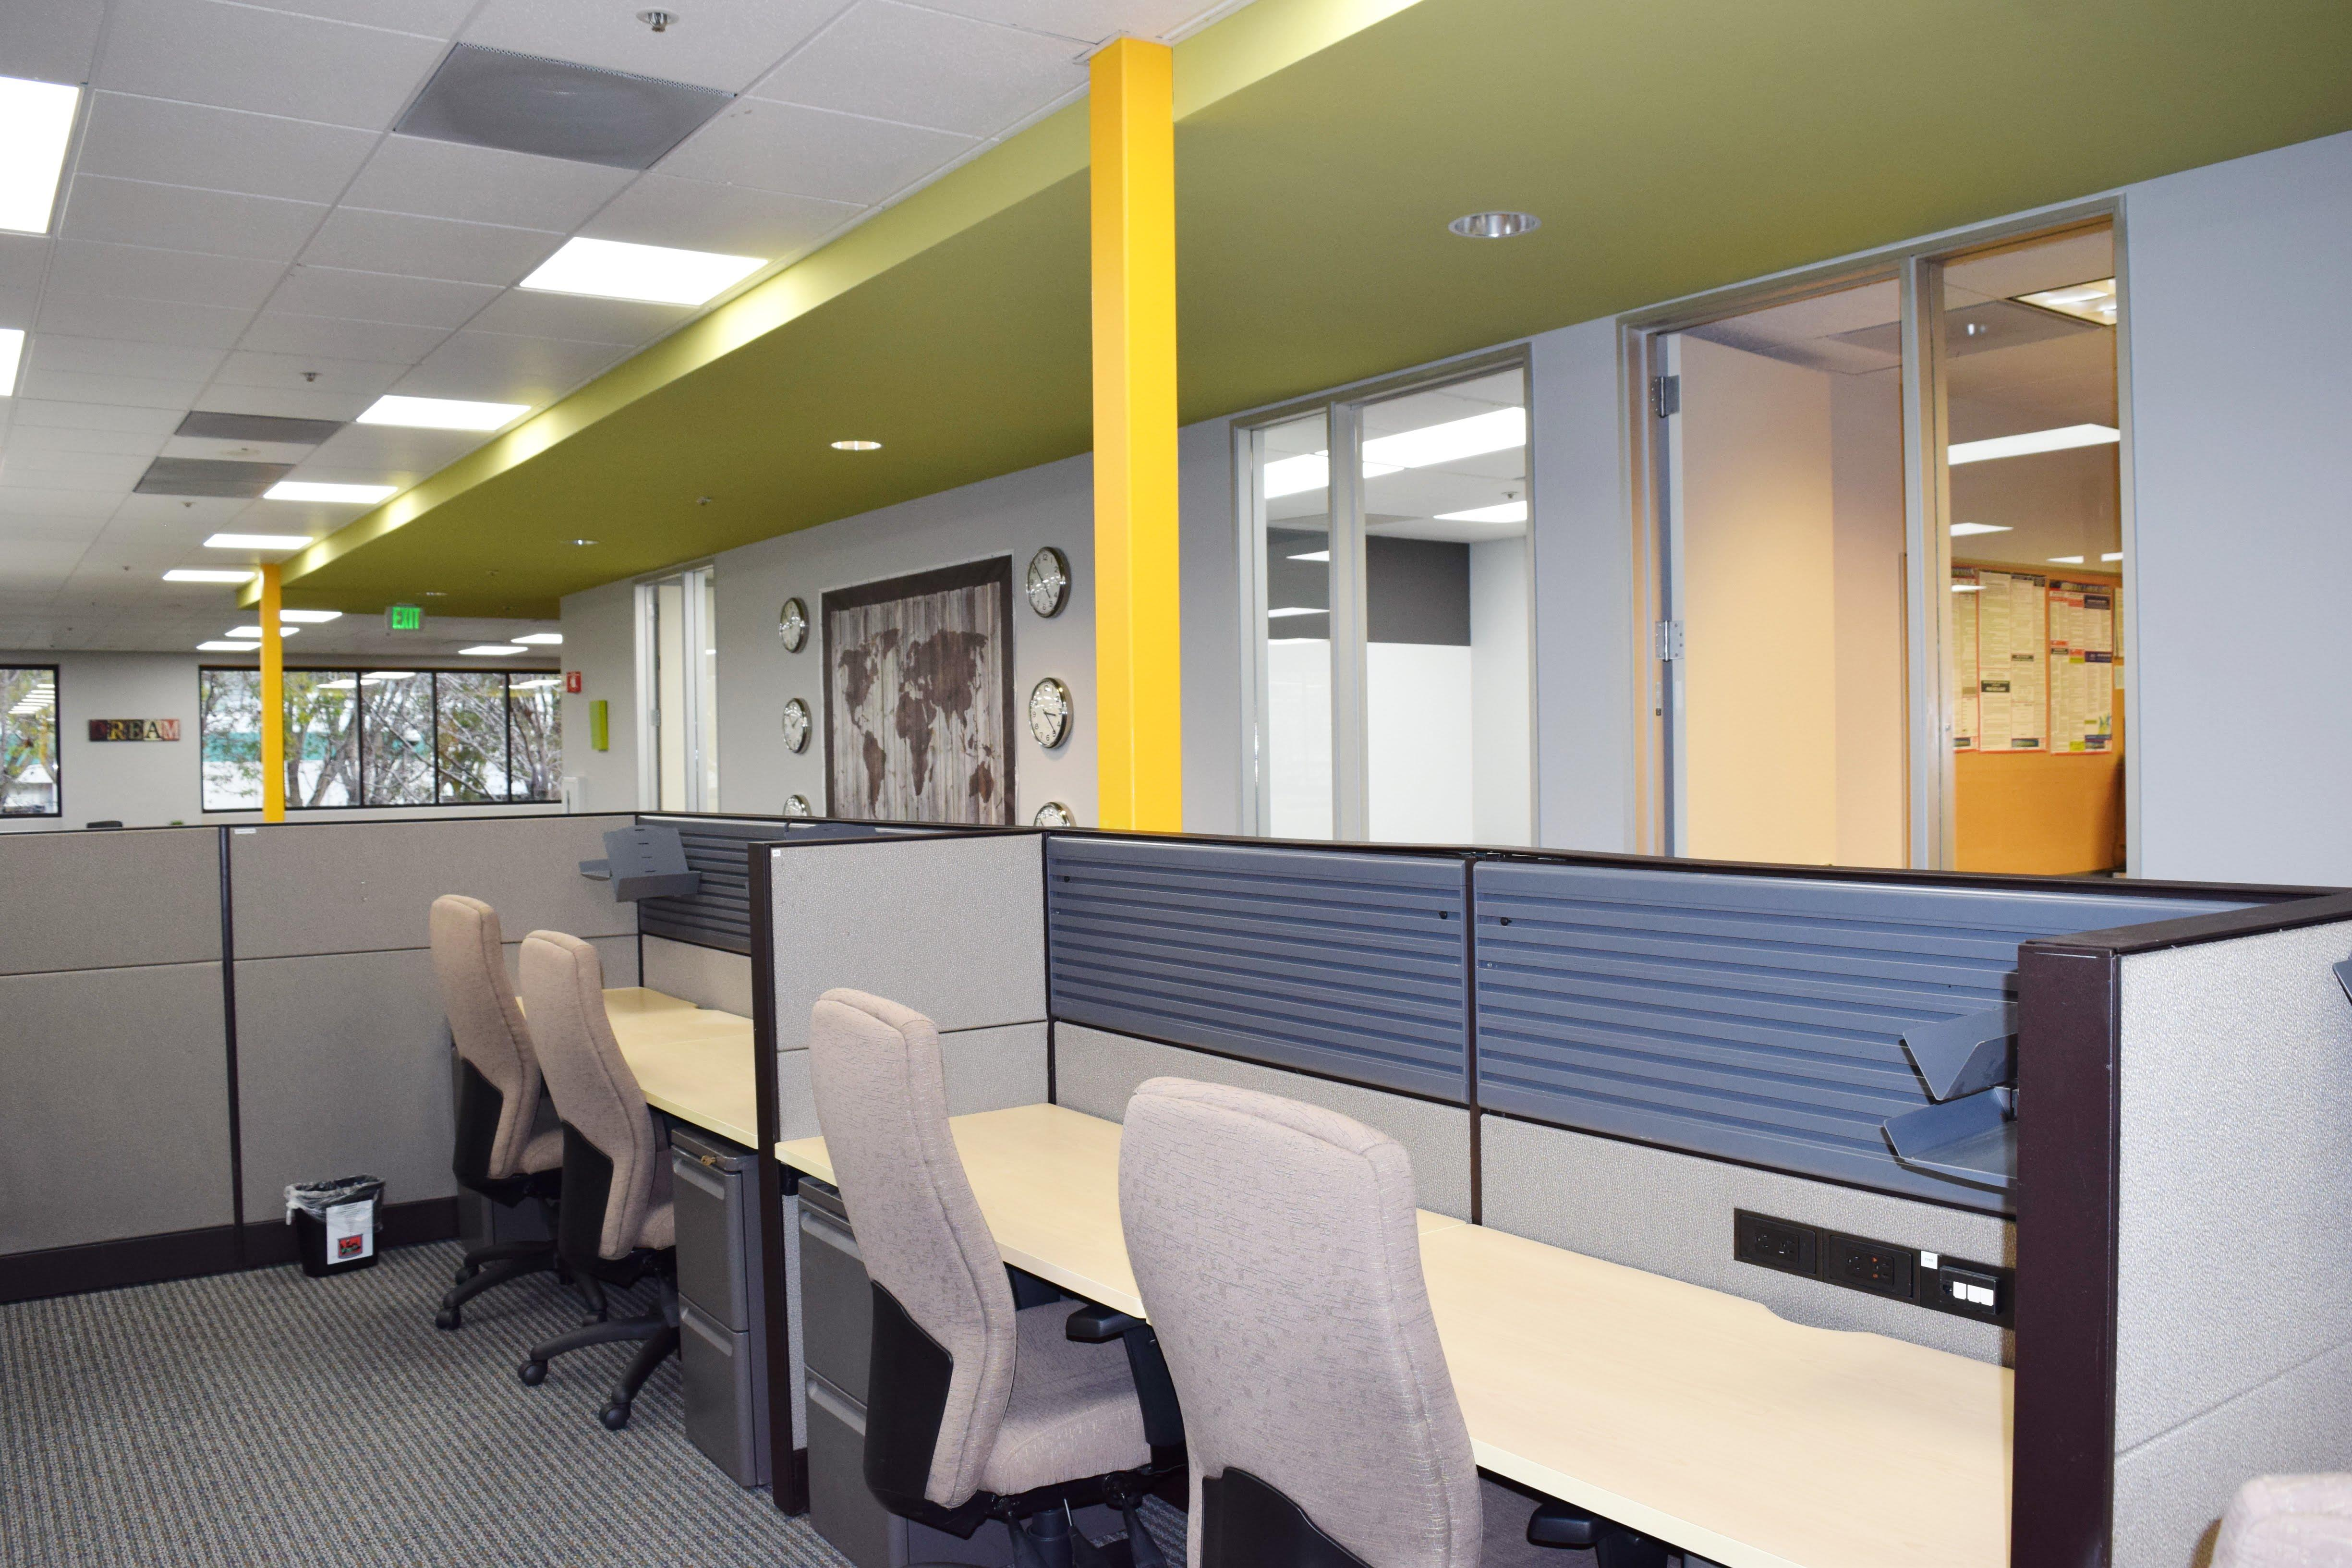 FalconX Incubator Accelerator - Dedicated Desk Large -18 available